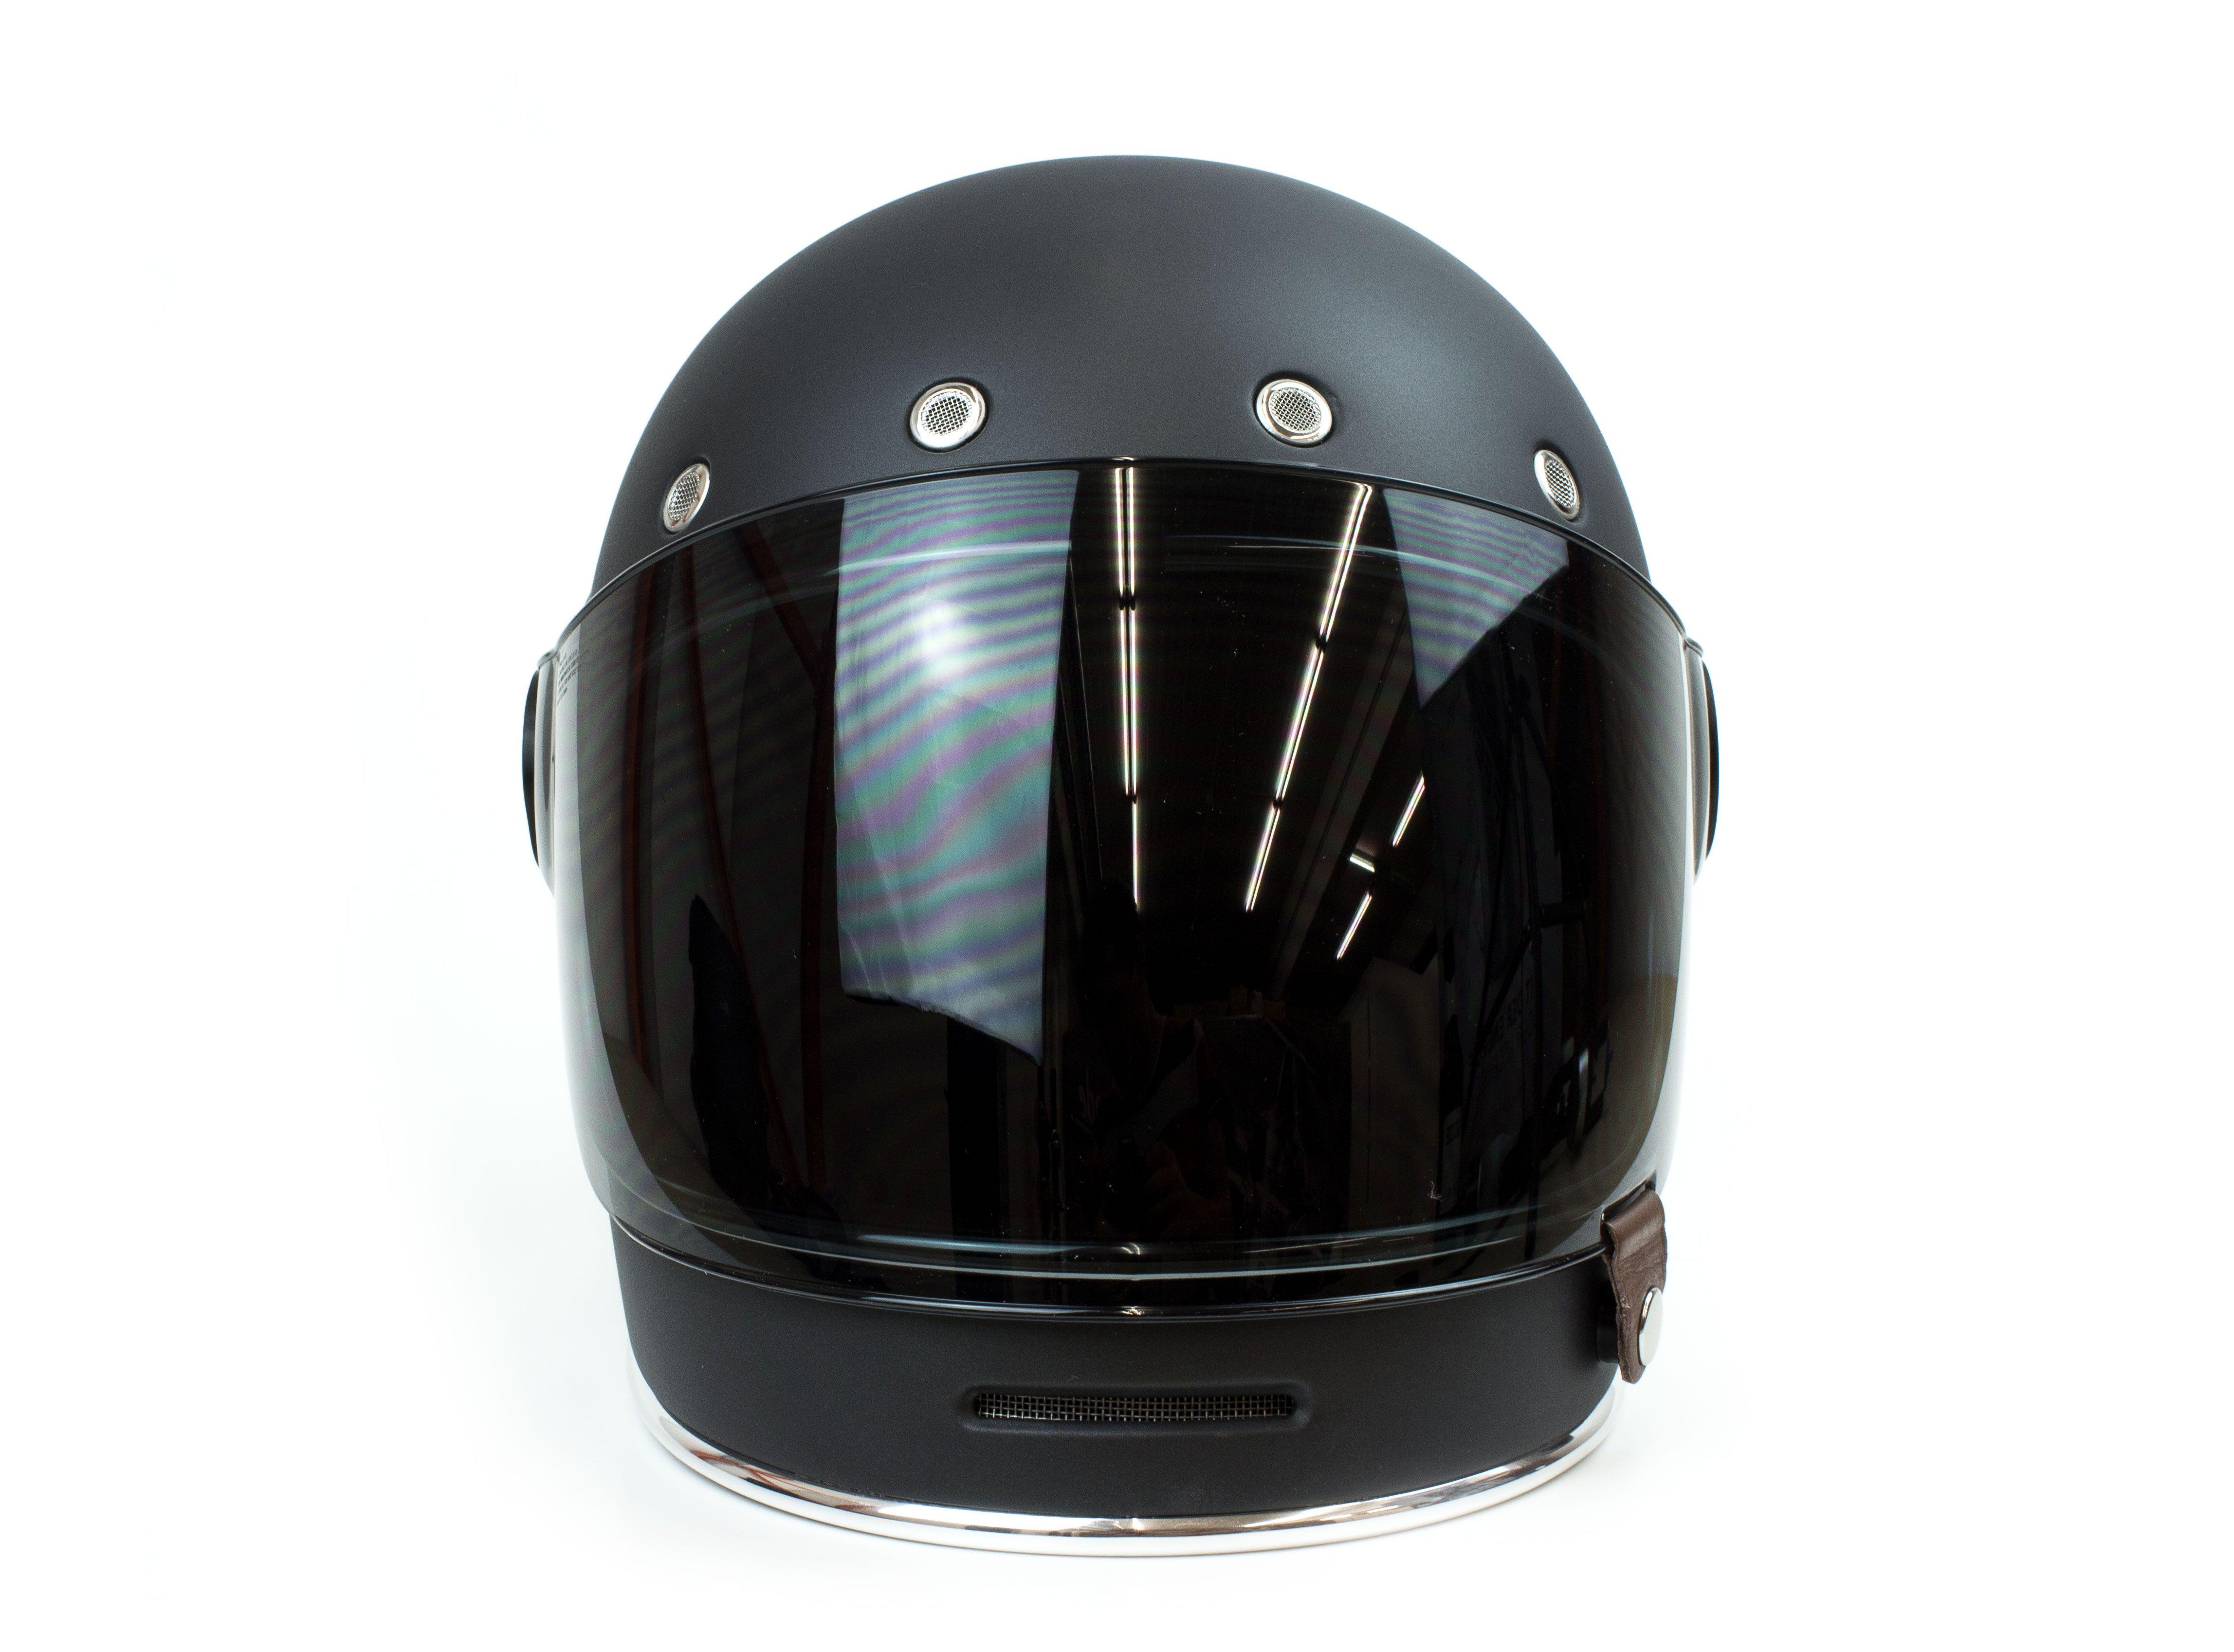 Helmade Inverted Gradient Helmetdesign Black Silver Matte Bell Bullitt Helmet Design Your Own On Www Helmade Com Helm